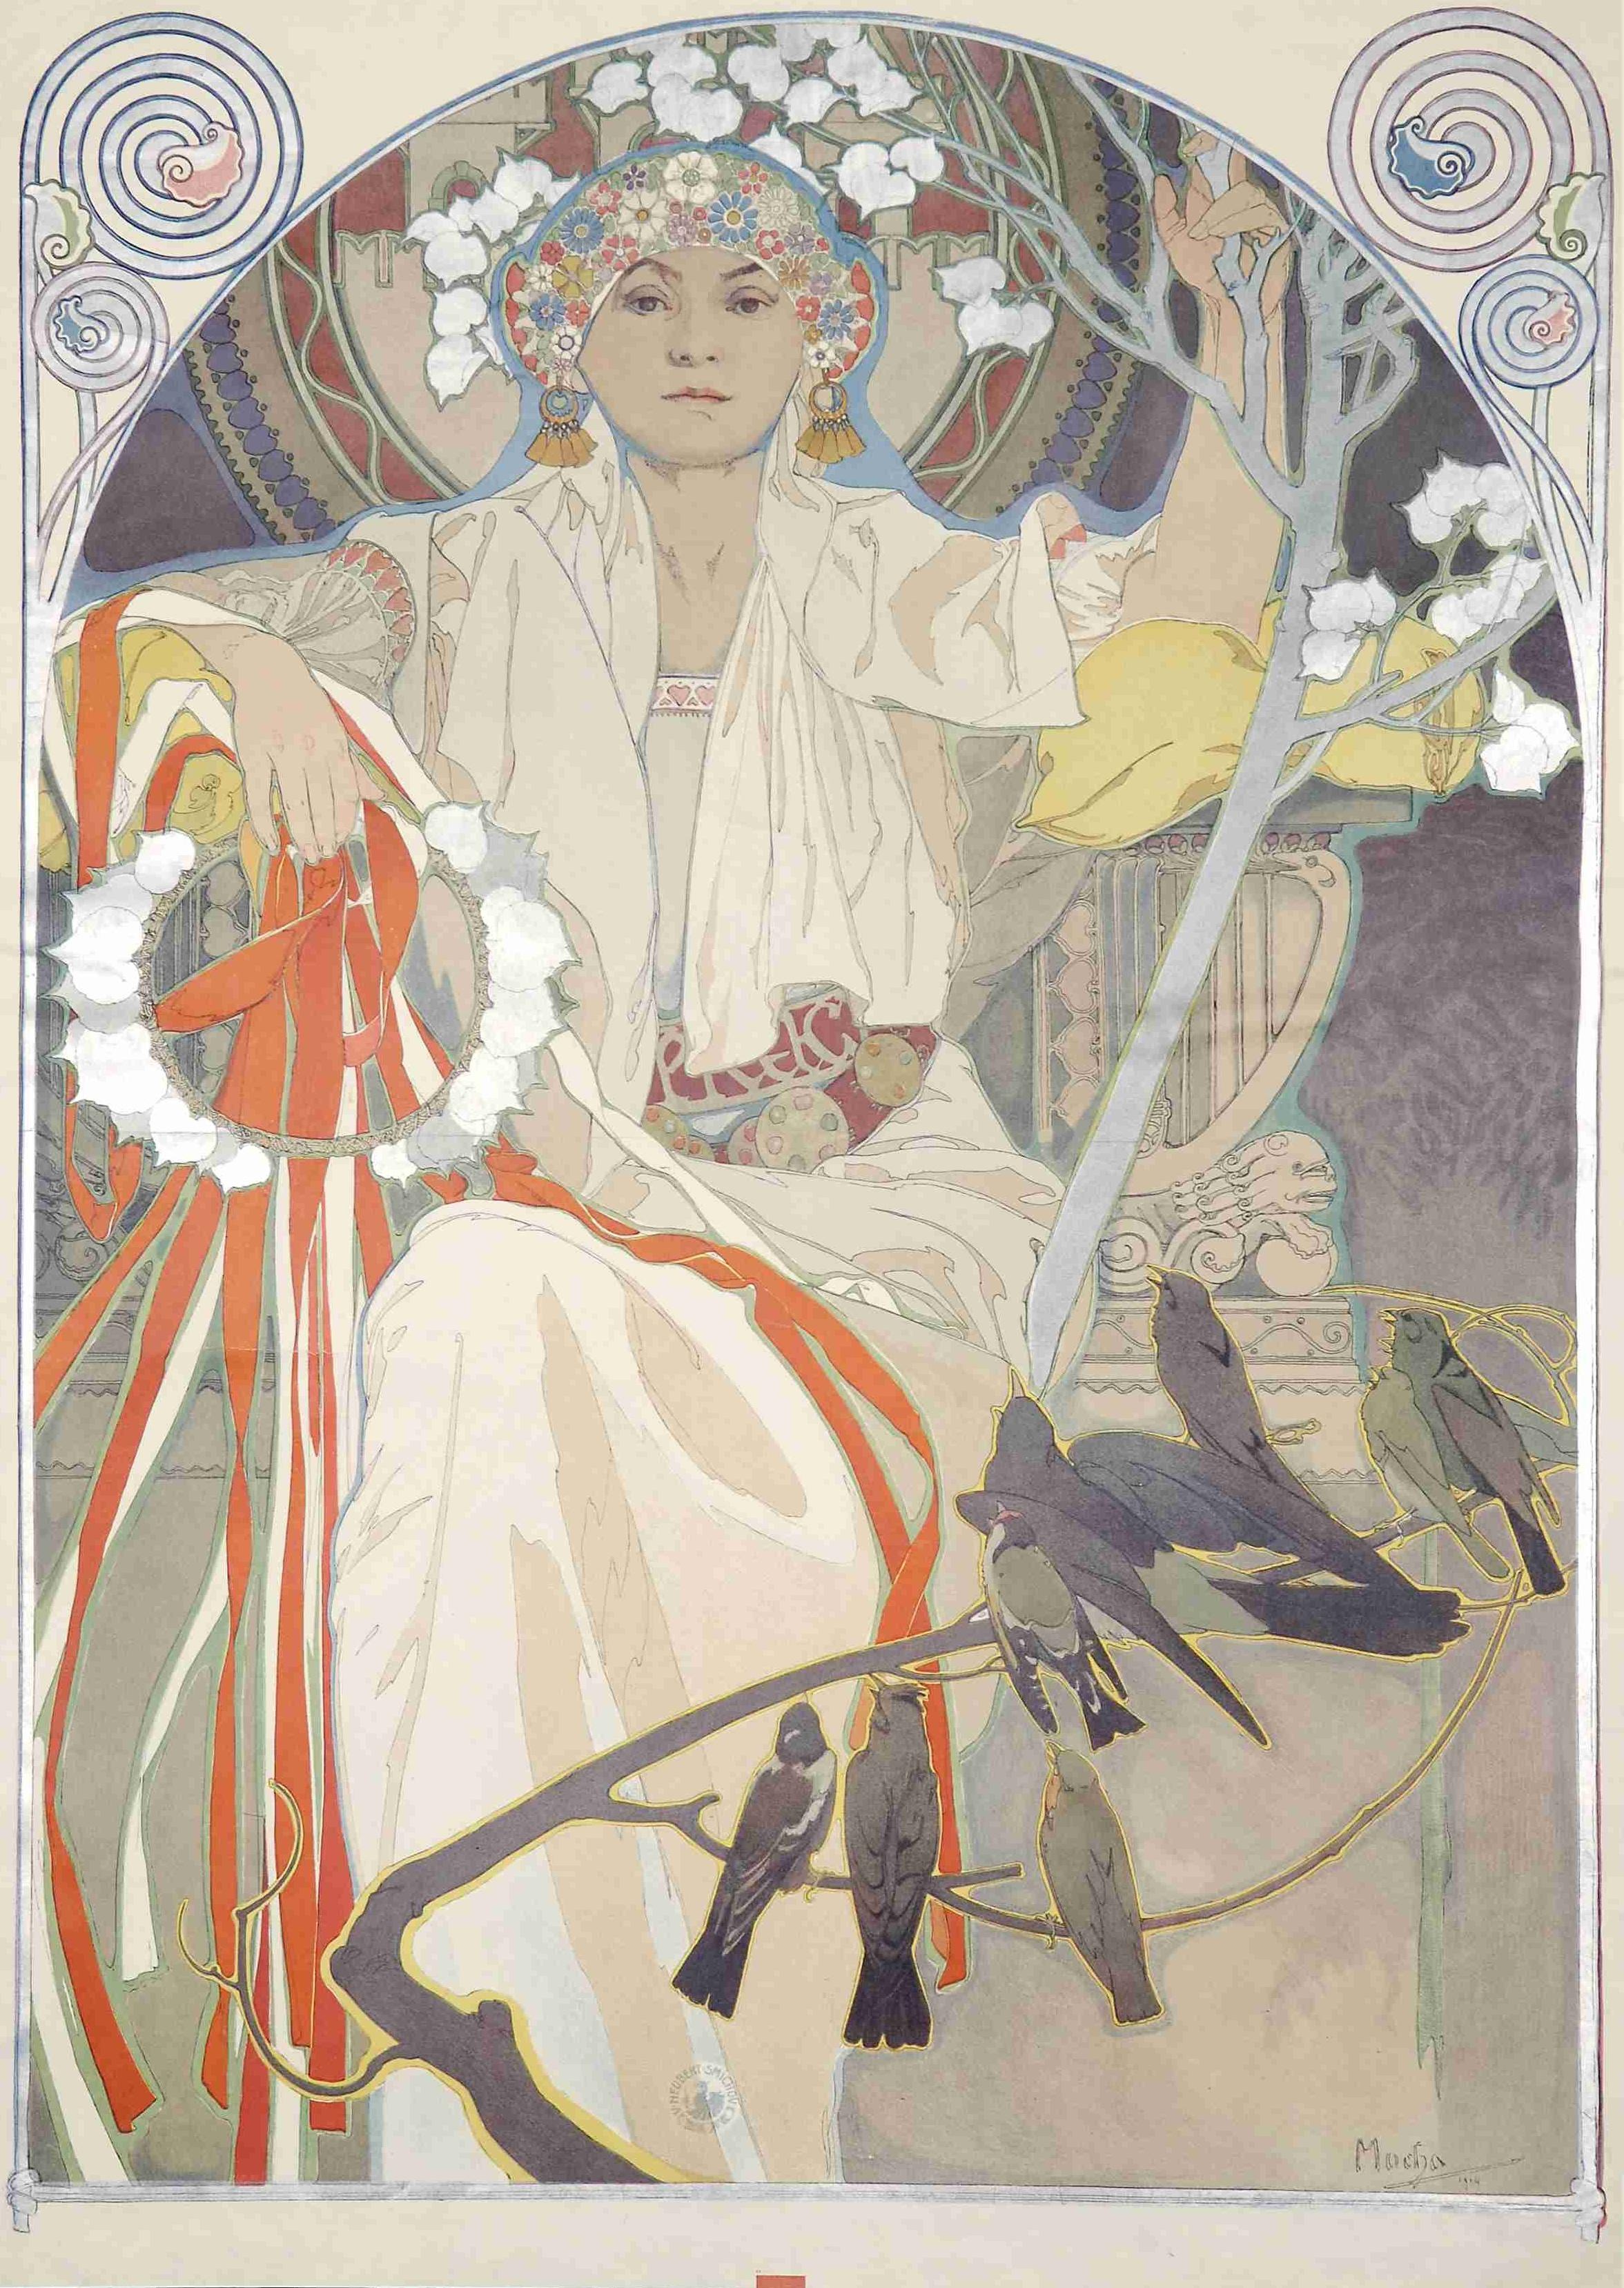 Плакат весенней музыки и песни Jarni Slavnosti-1914